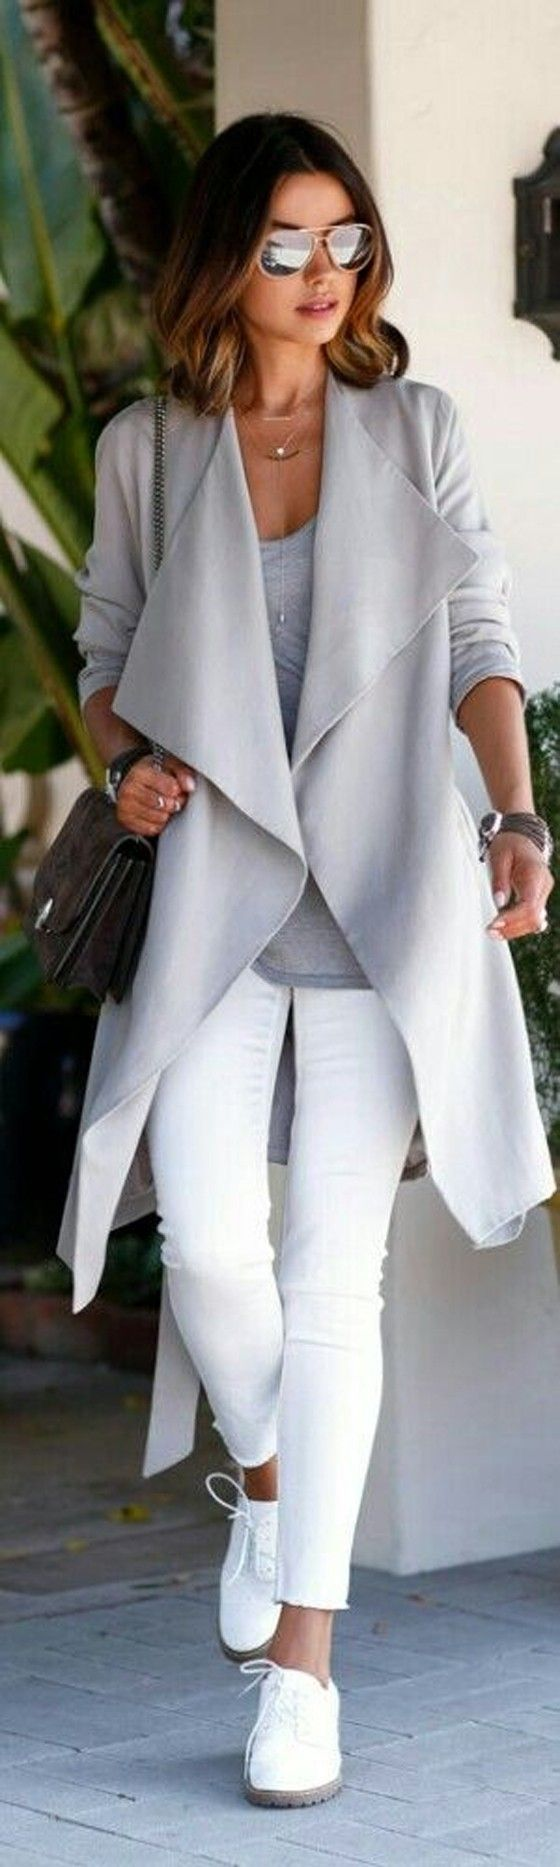 Grey Plain Belt Pockets Turndown Collar Long Sleeve Trench Coat - http://www.popularaz.com/grey-plain-belt-pockets-turndown-collar-long-sleeve-trench-coat/